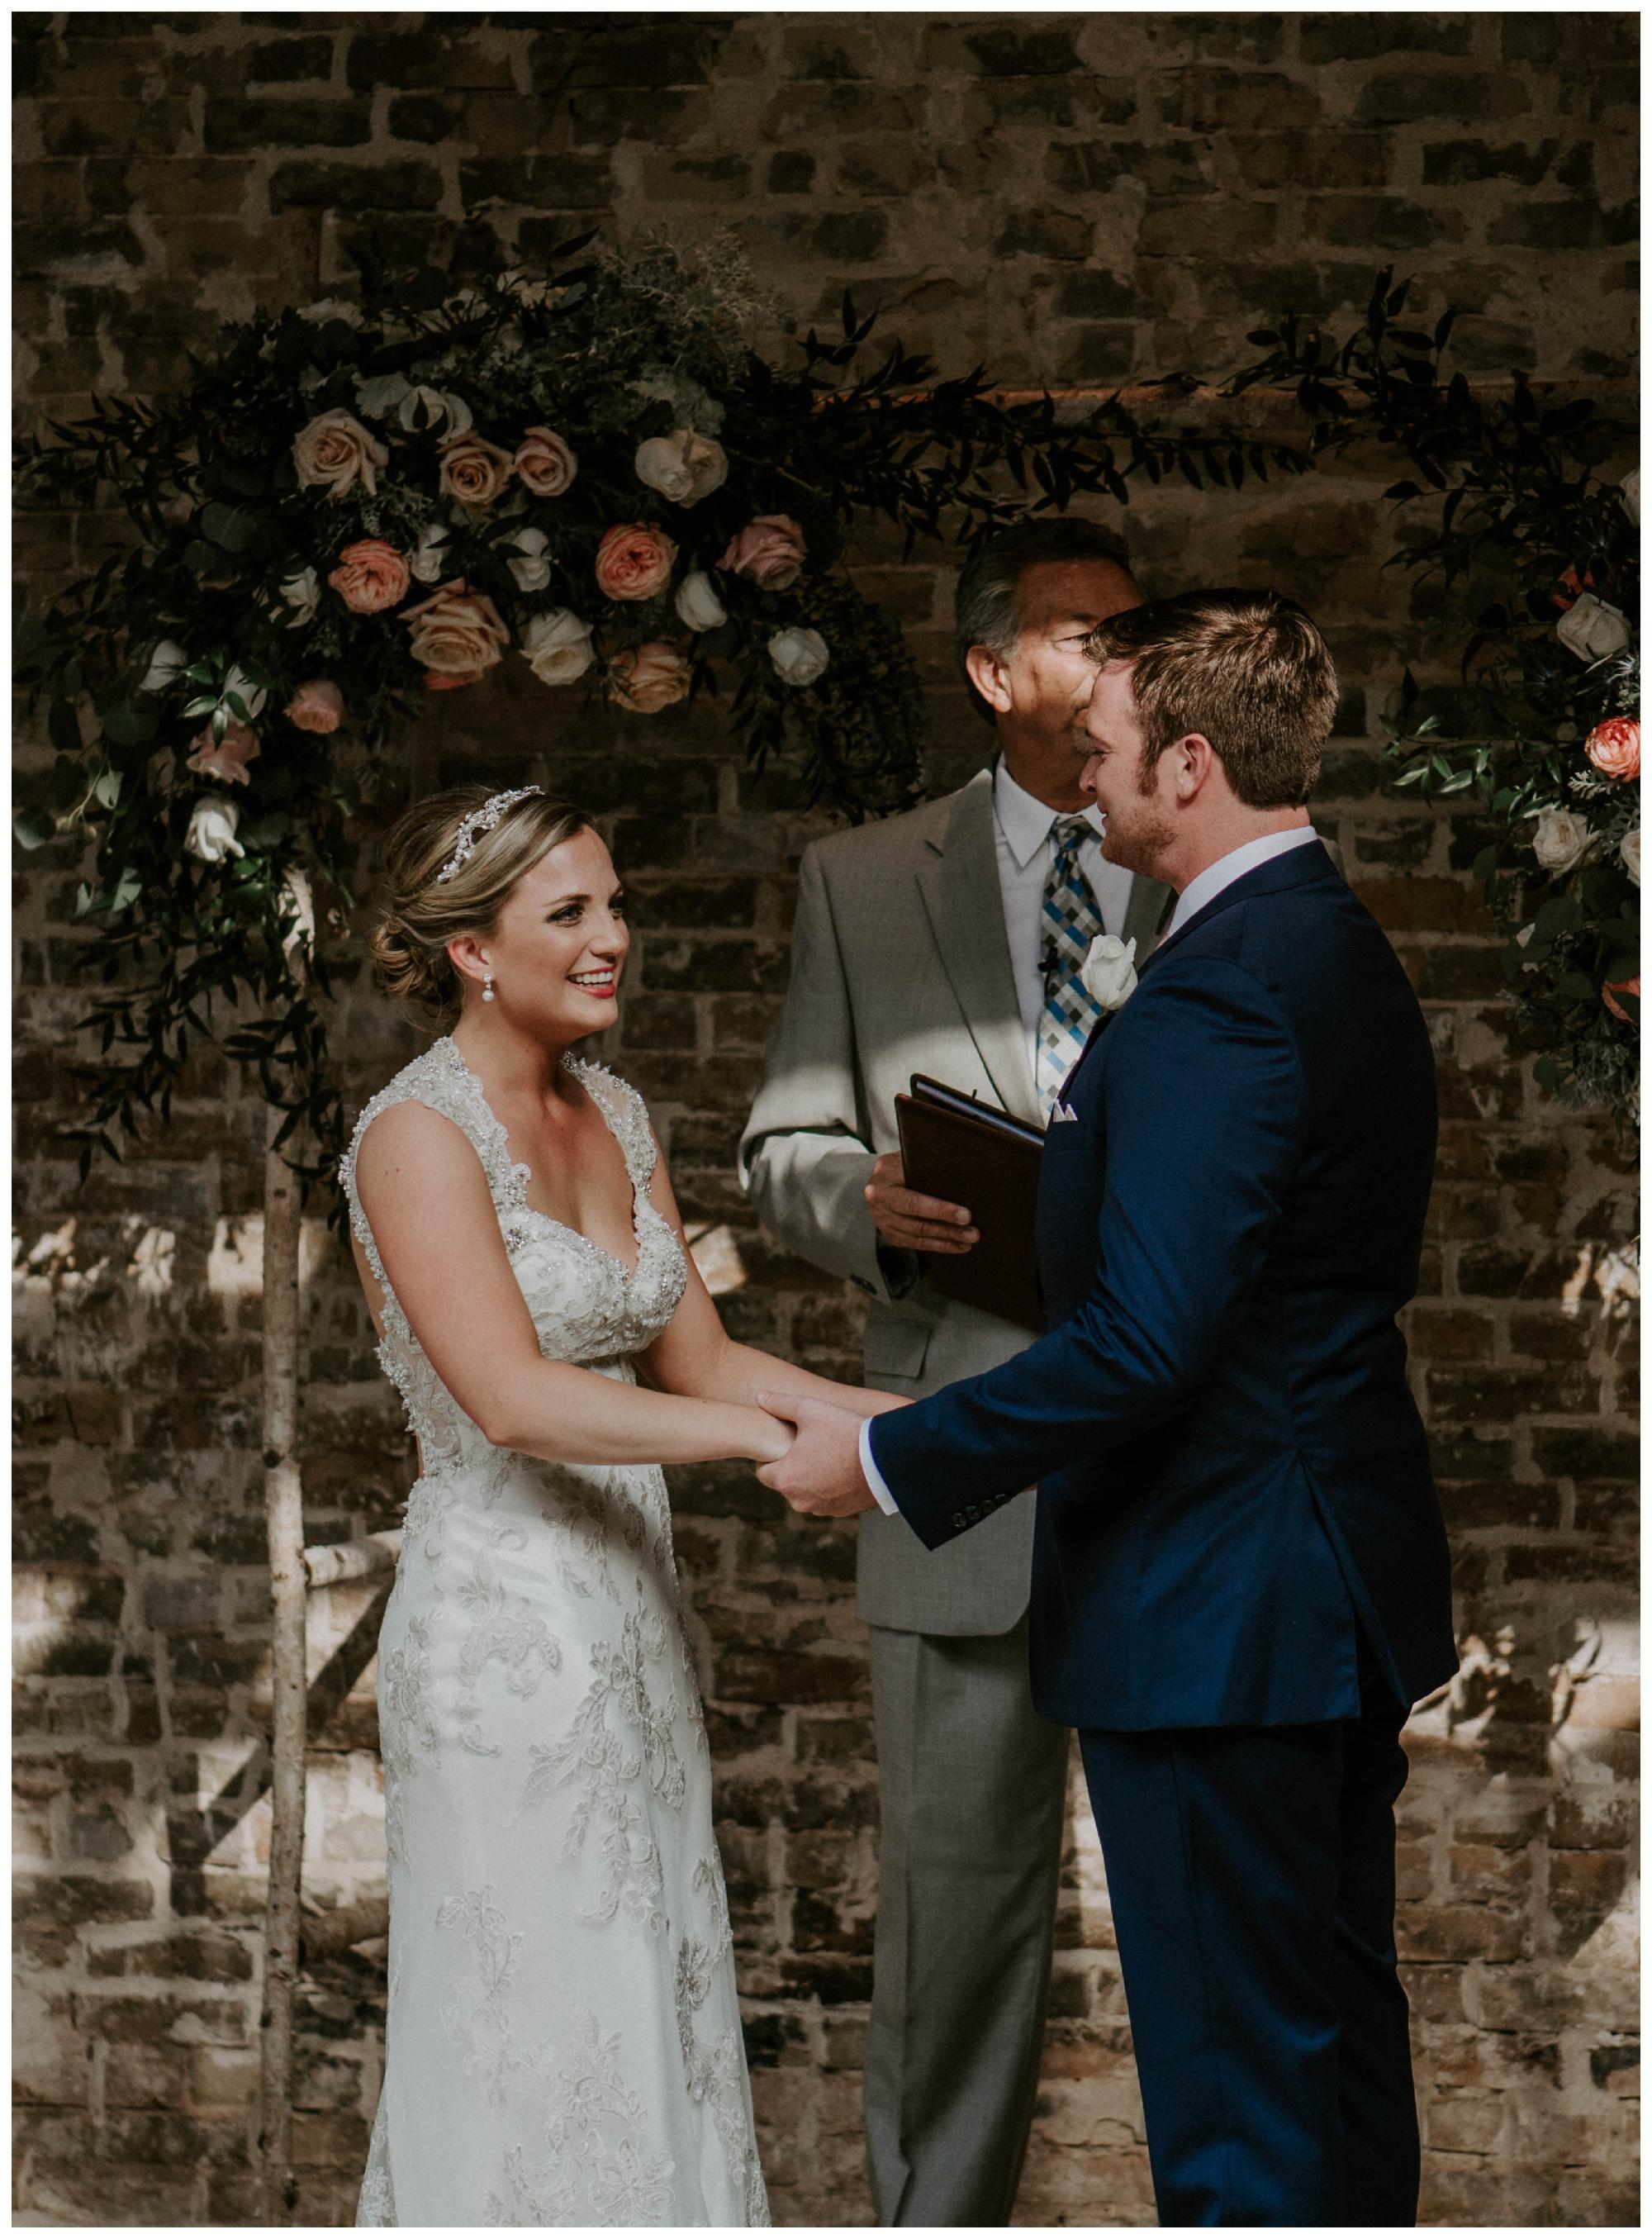 austin-texas-wedding-photography-1778-photographie_0060.jpg